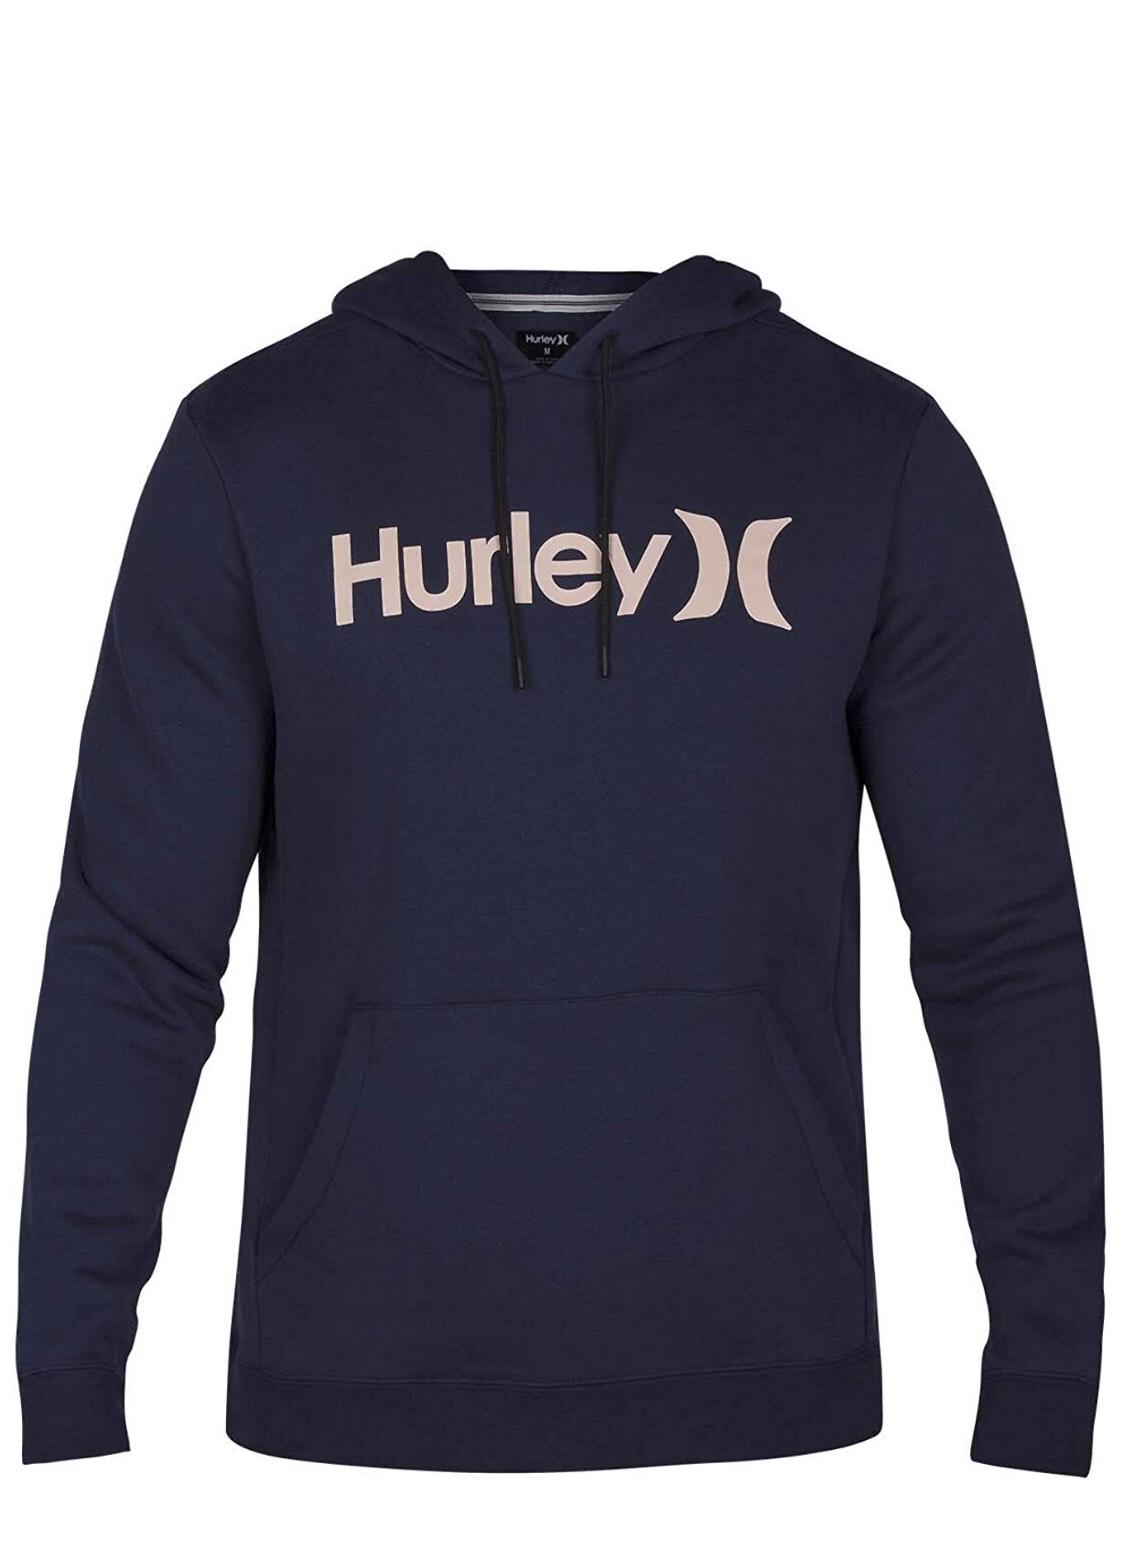 Sudadera Hurley azul XXL